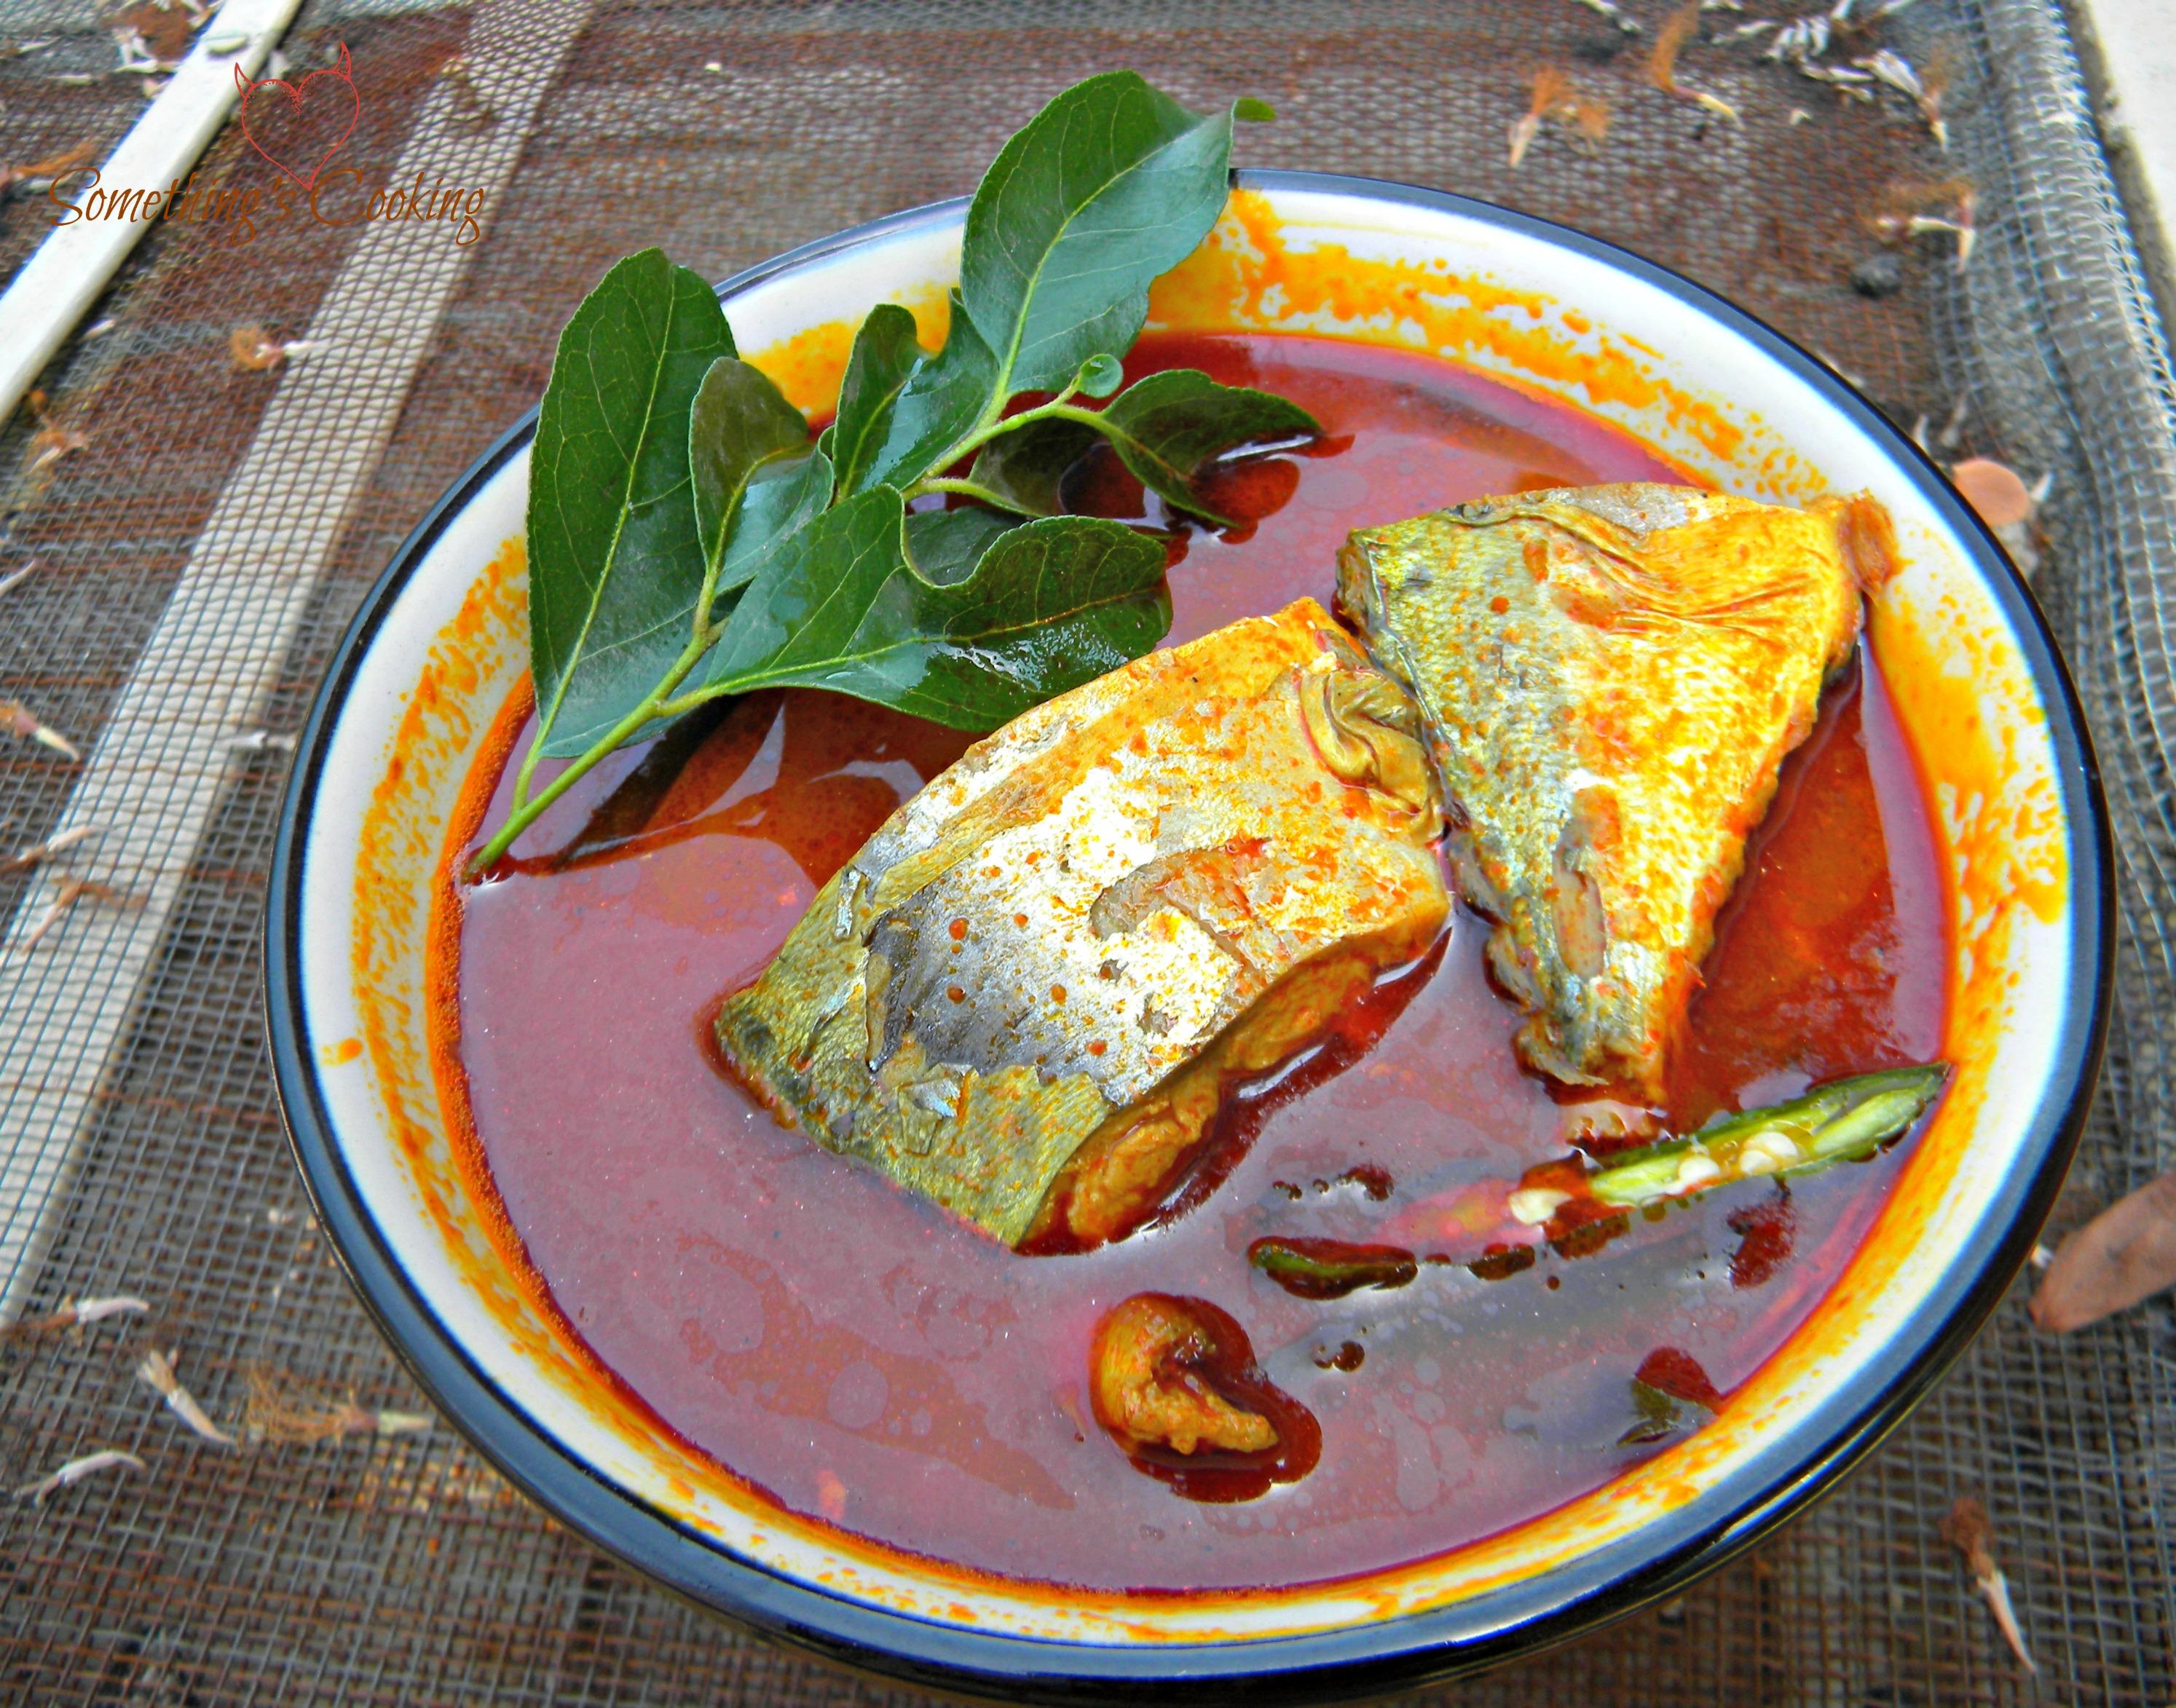 Ayala Fish Curry or Mackeral Fish Curry from Kerala, India